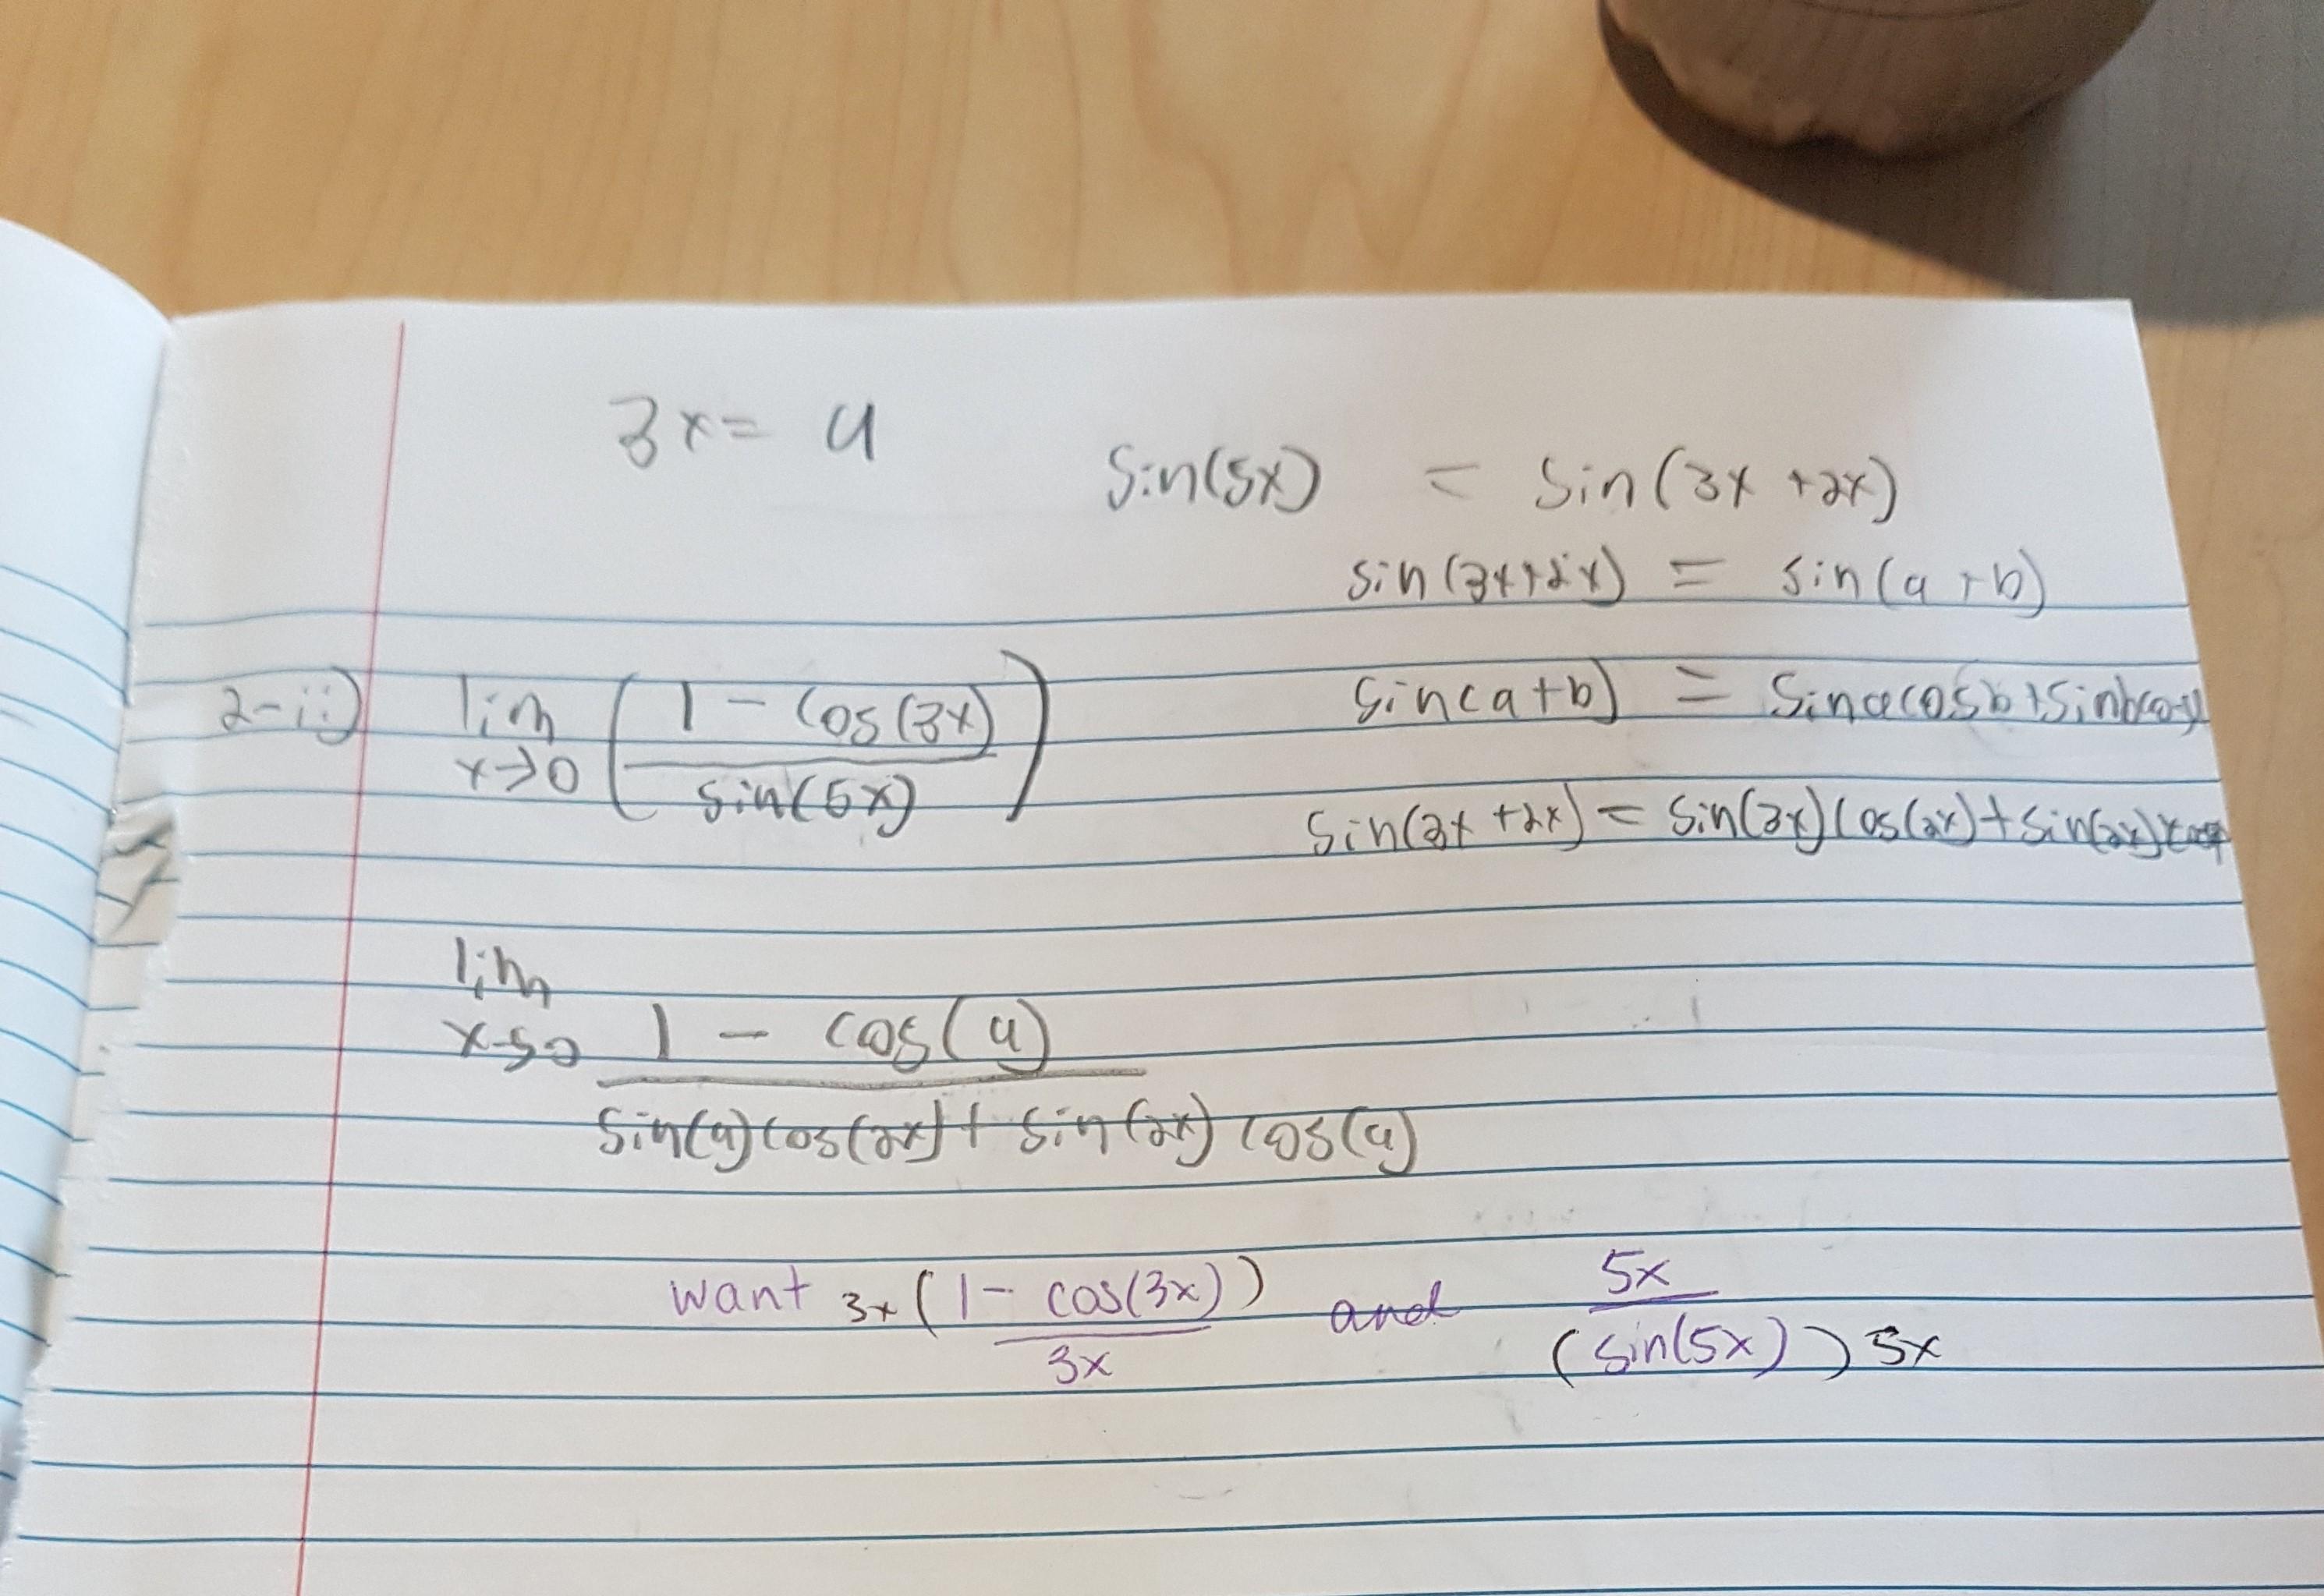 Q2 part 2